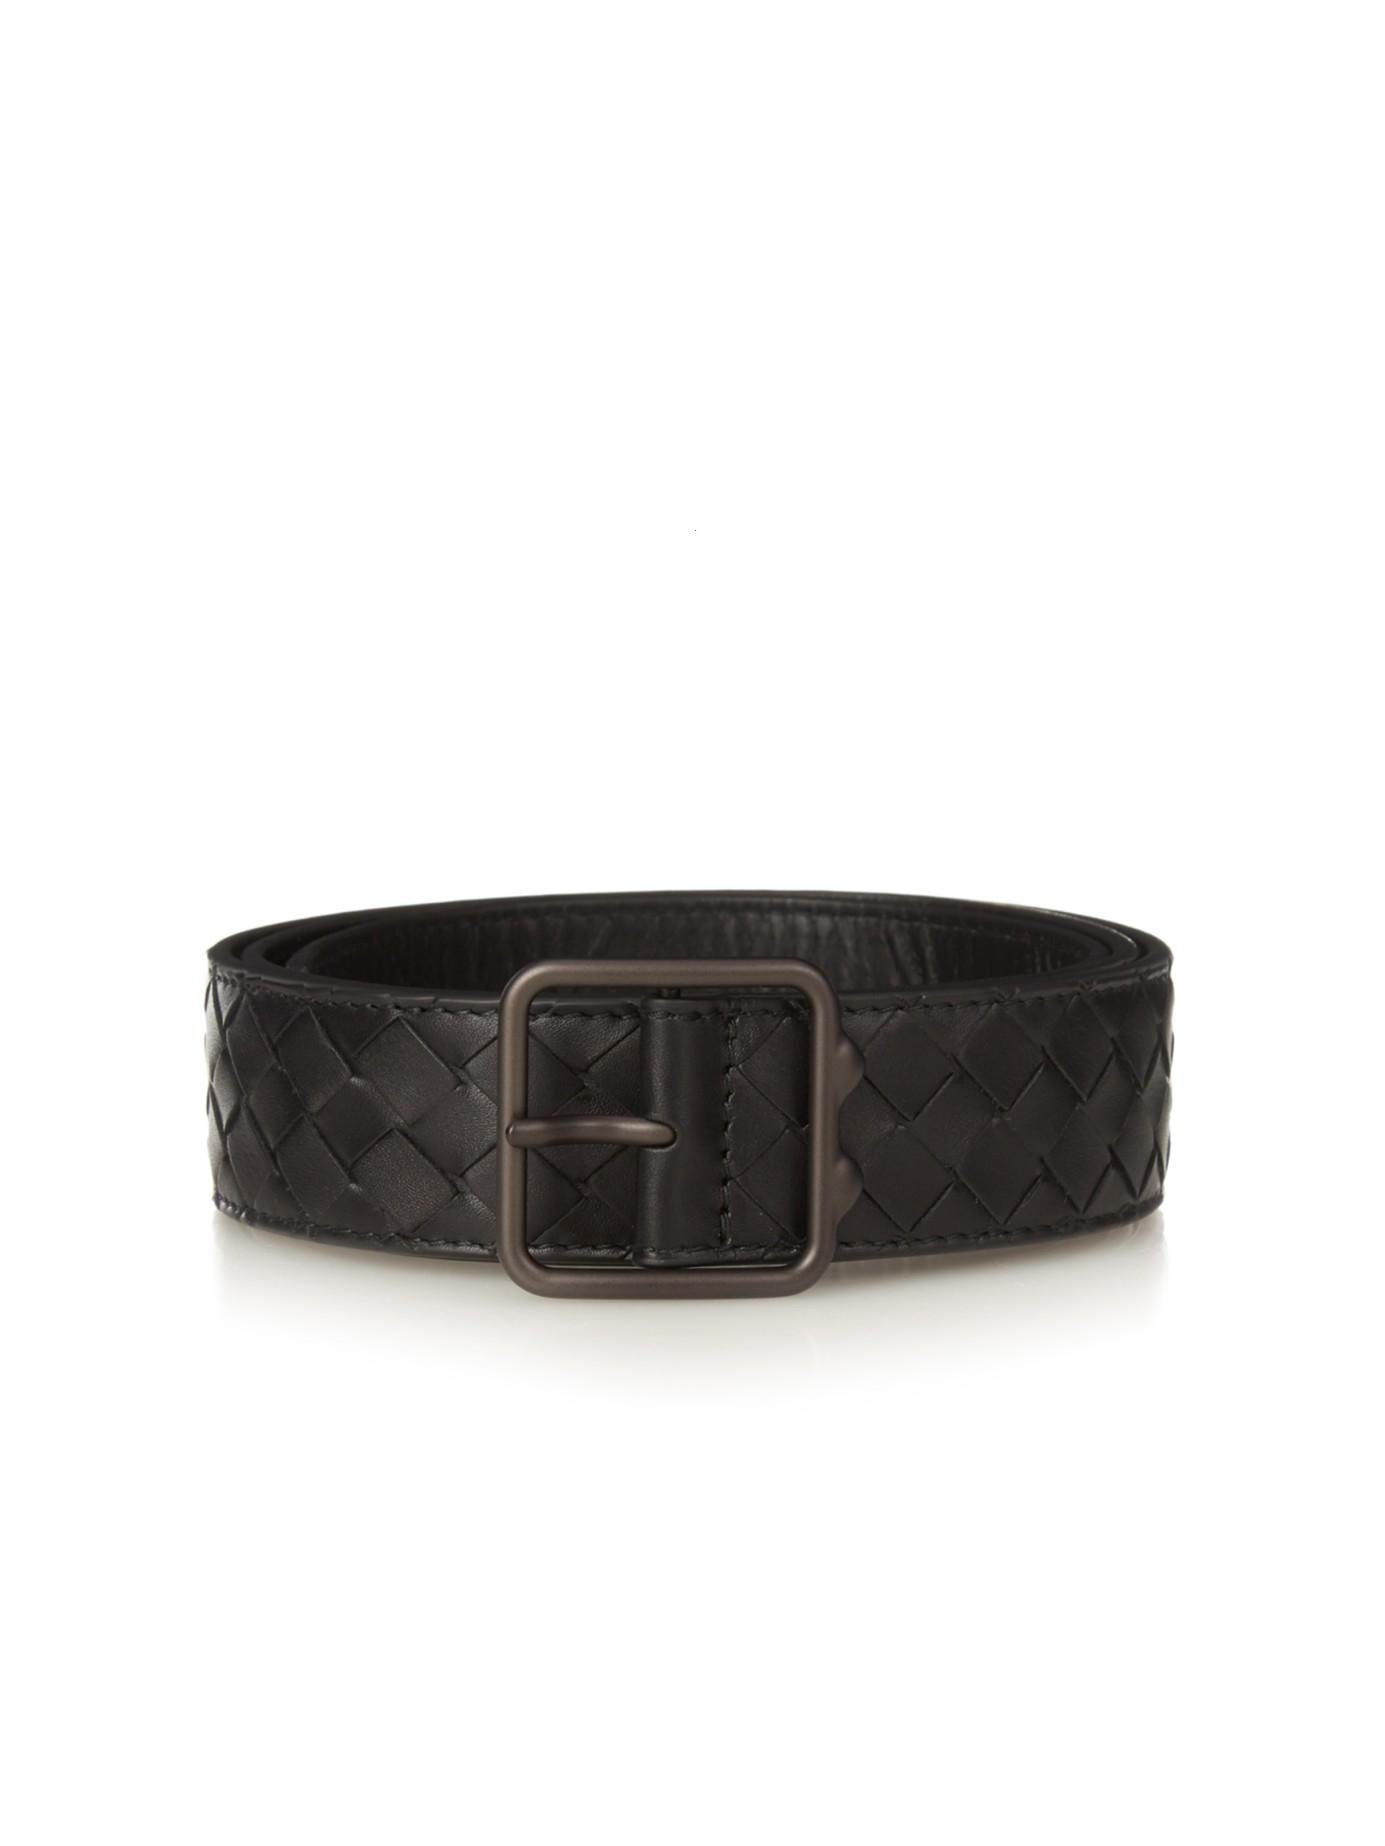 Intrecciato Leather Belt - Black Bottega Veneta hKIlo